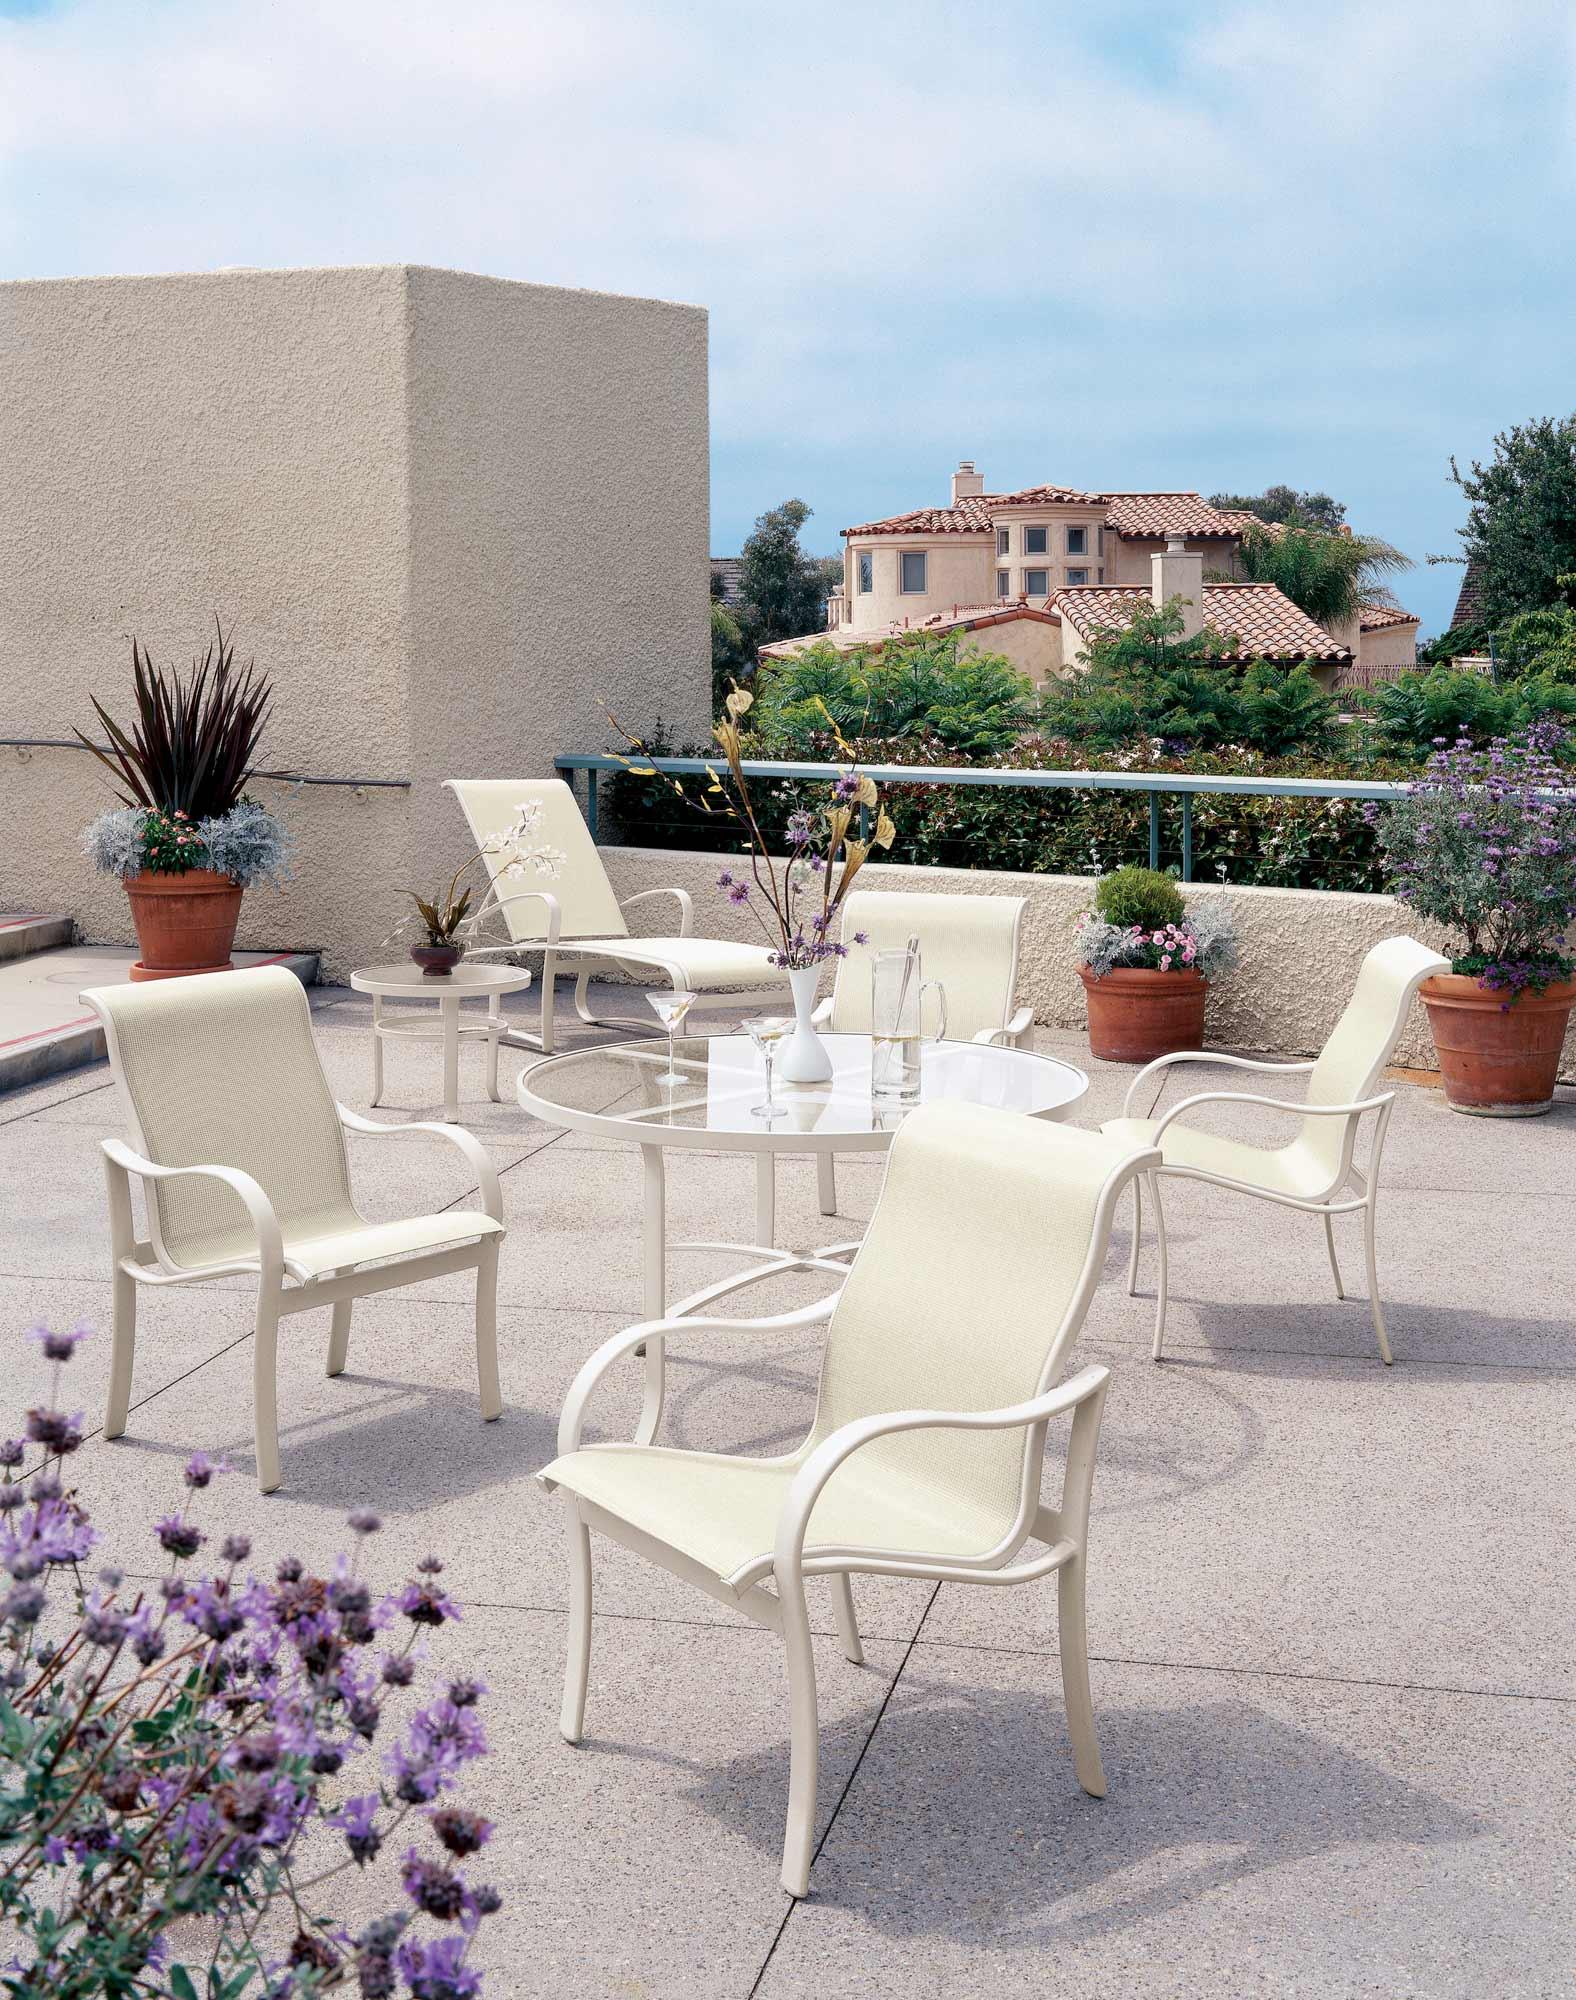 Tropitone Furniture Home Chairs And Furniture - Tropitone outdoor furniture